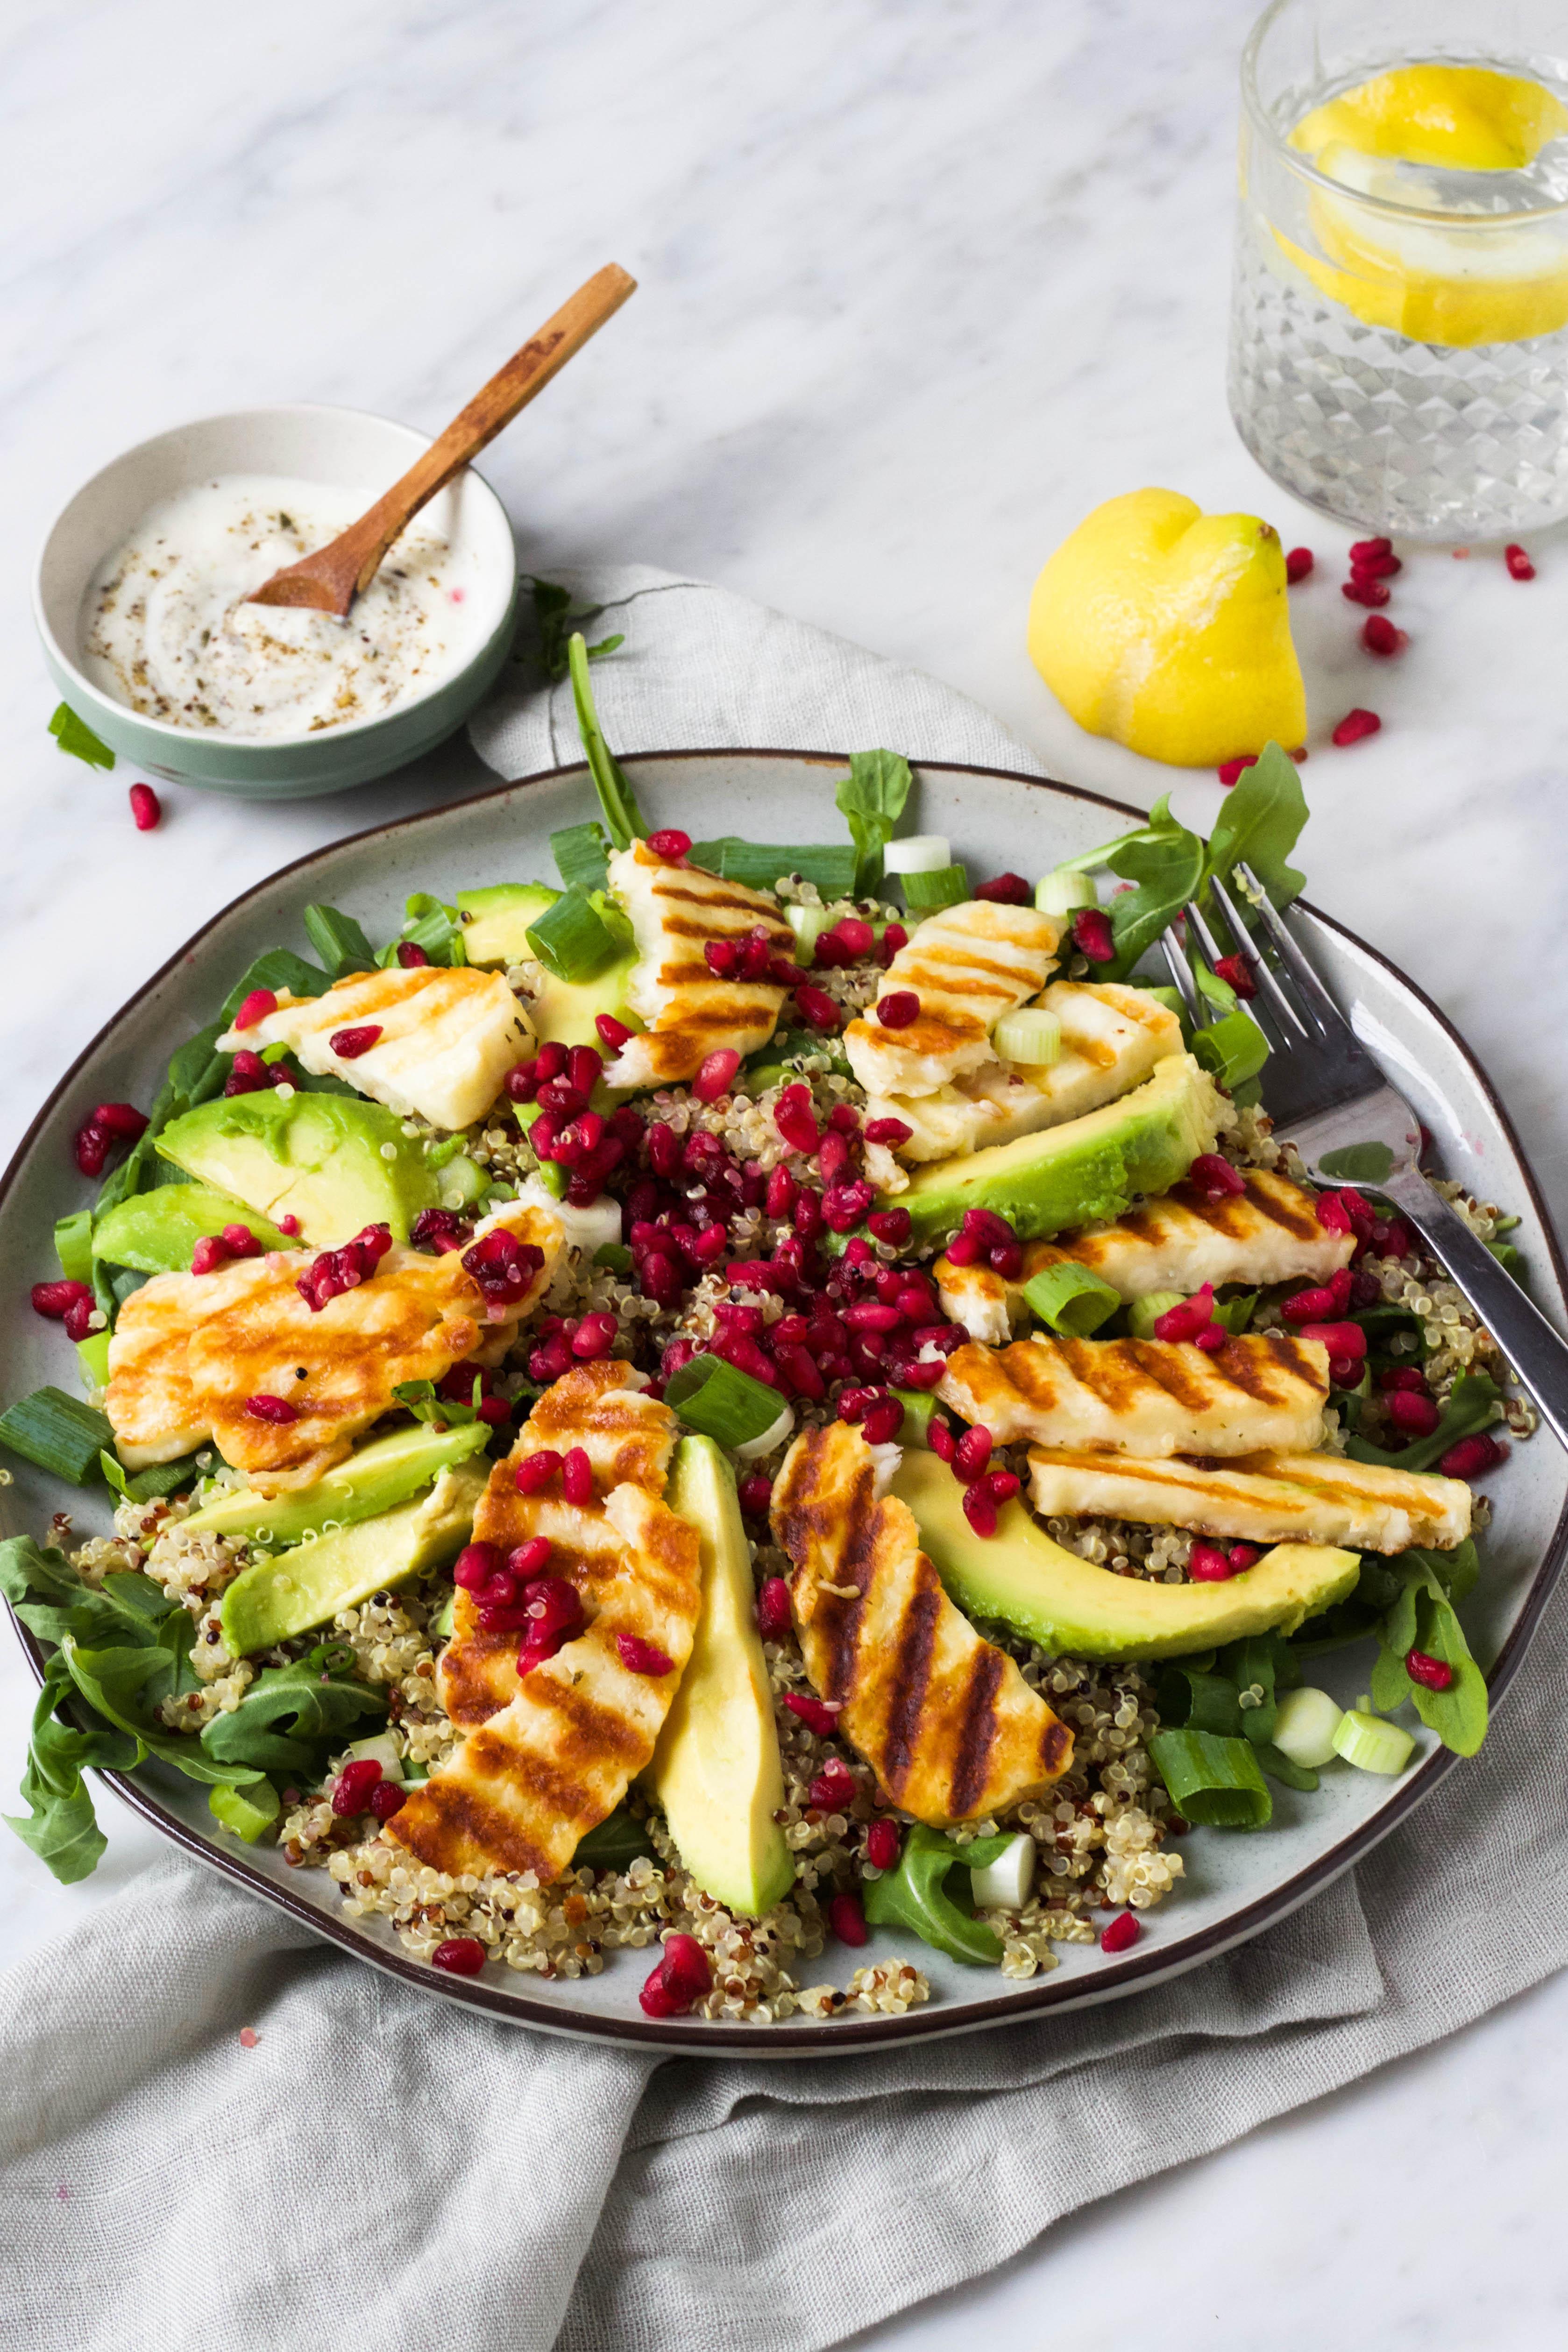 salade met quinoa en halloumi